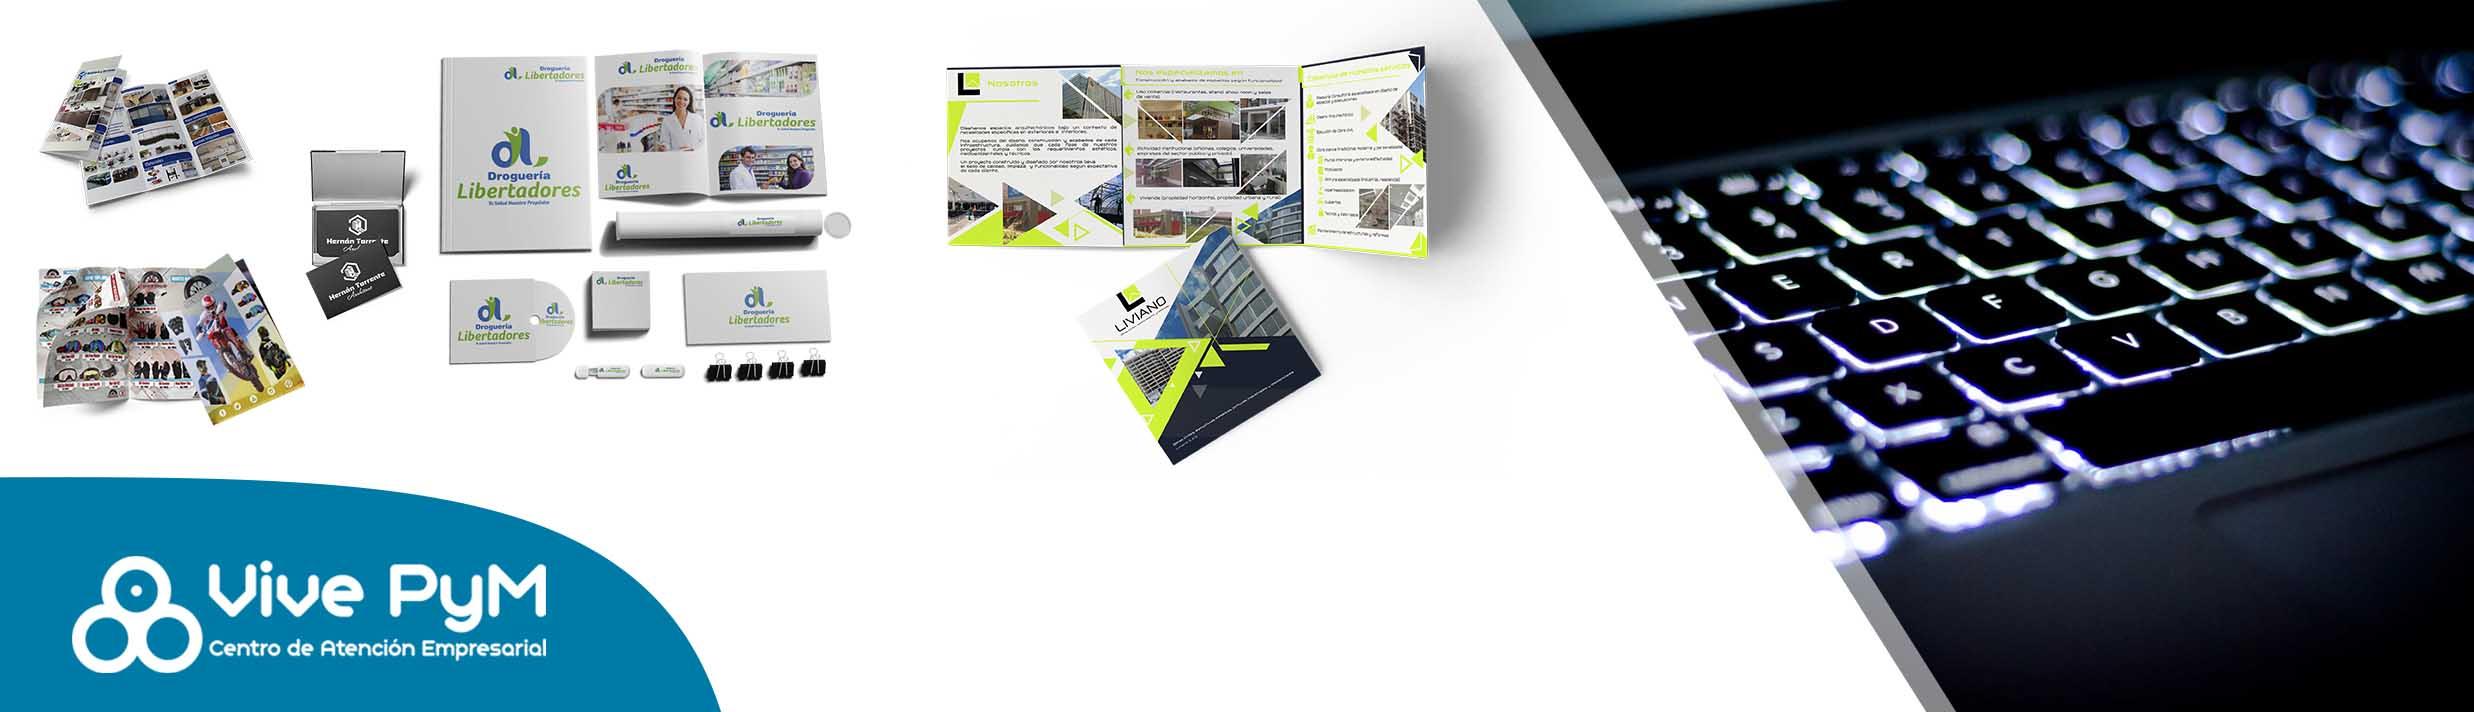 https://vivepym.com/wp-content/uploads/2018/02/diseño-grafico.jpg